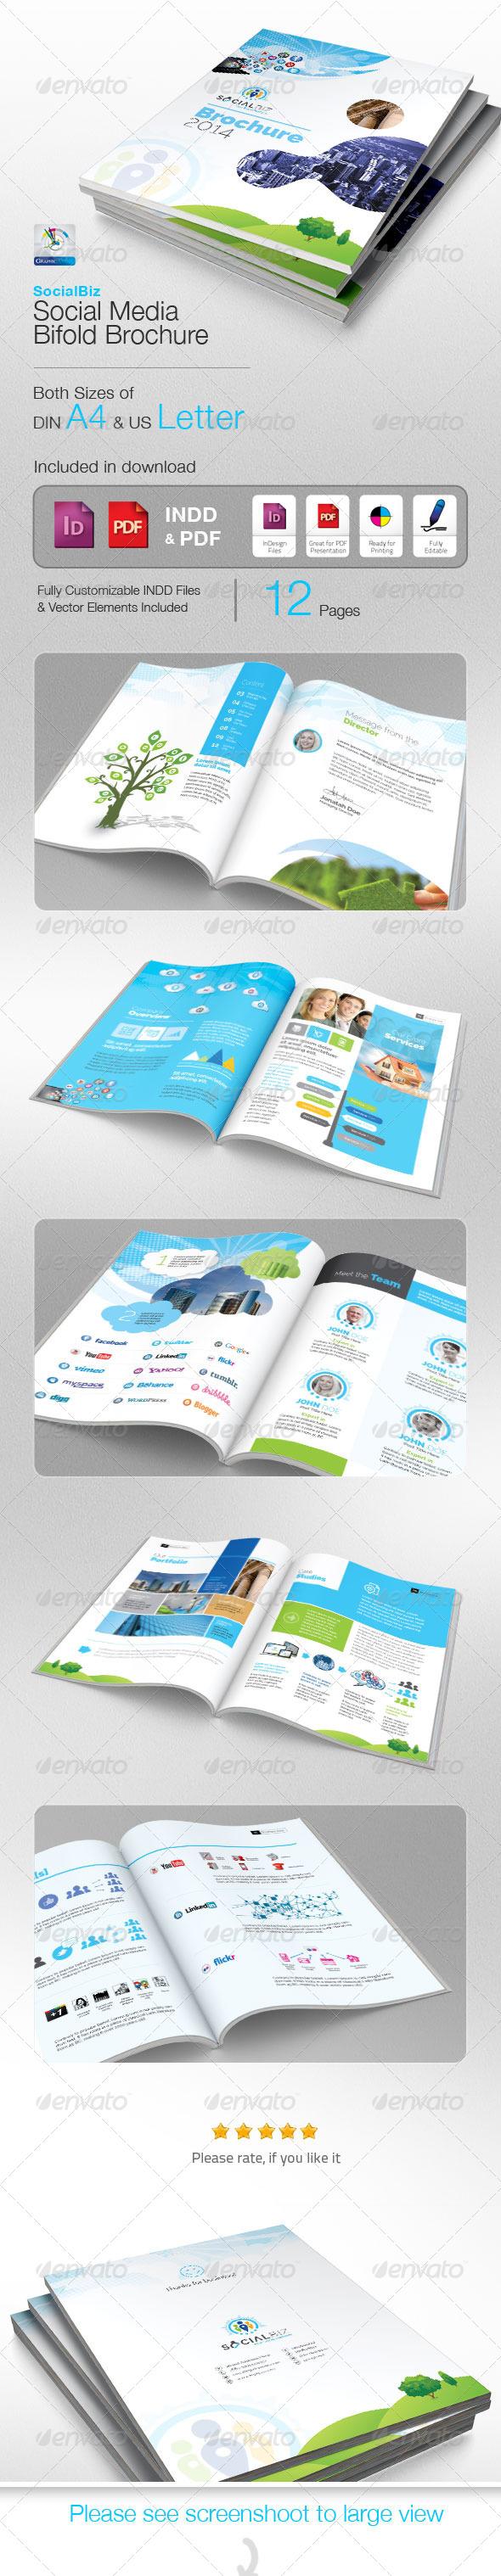 Socialbiz Professional Social Media Brochure  Brochures Annual